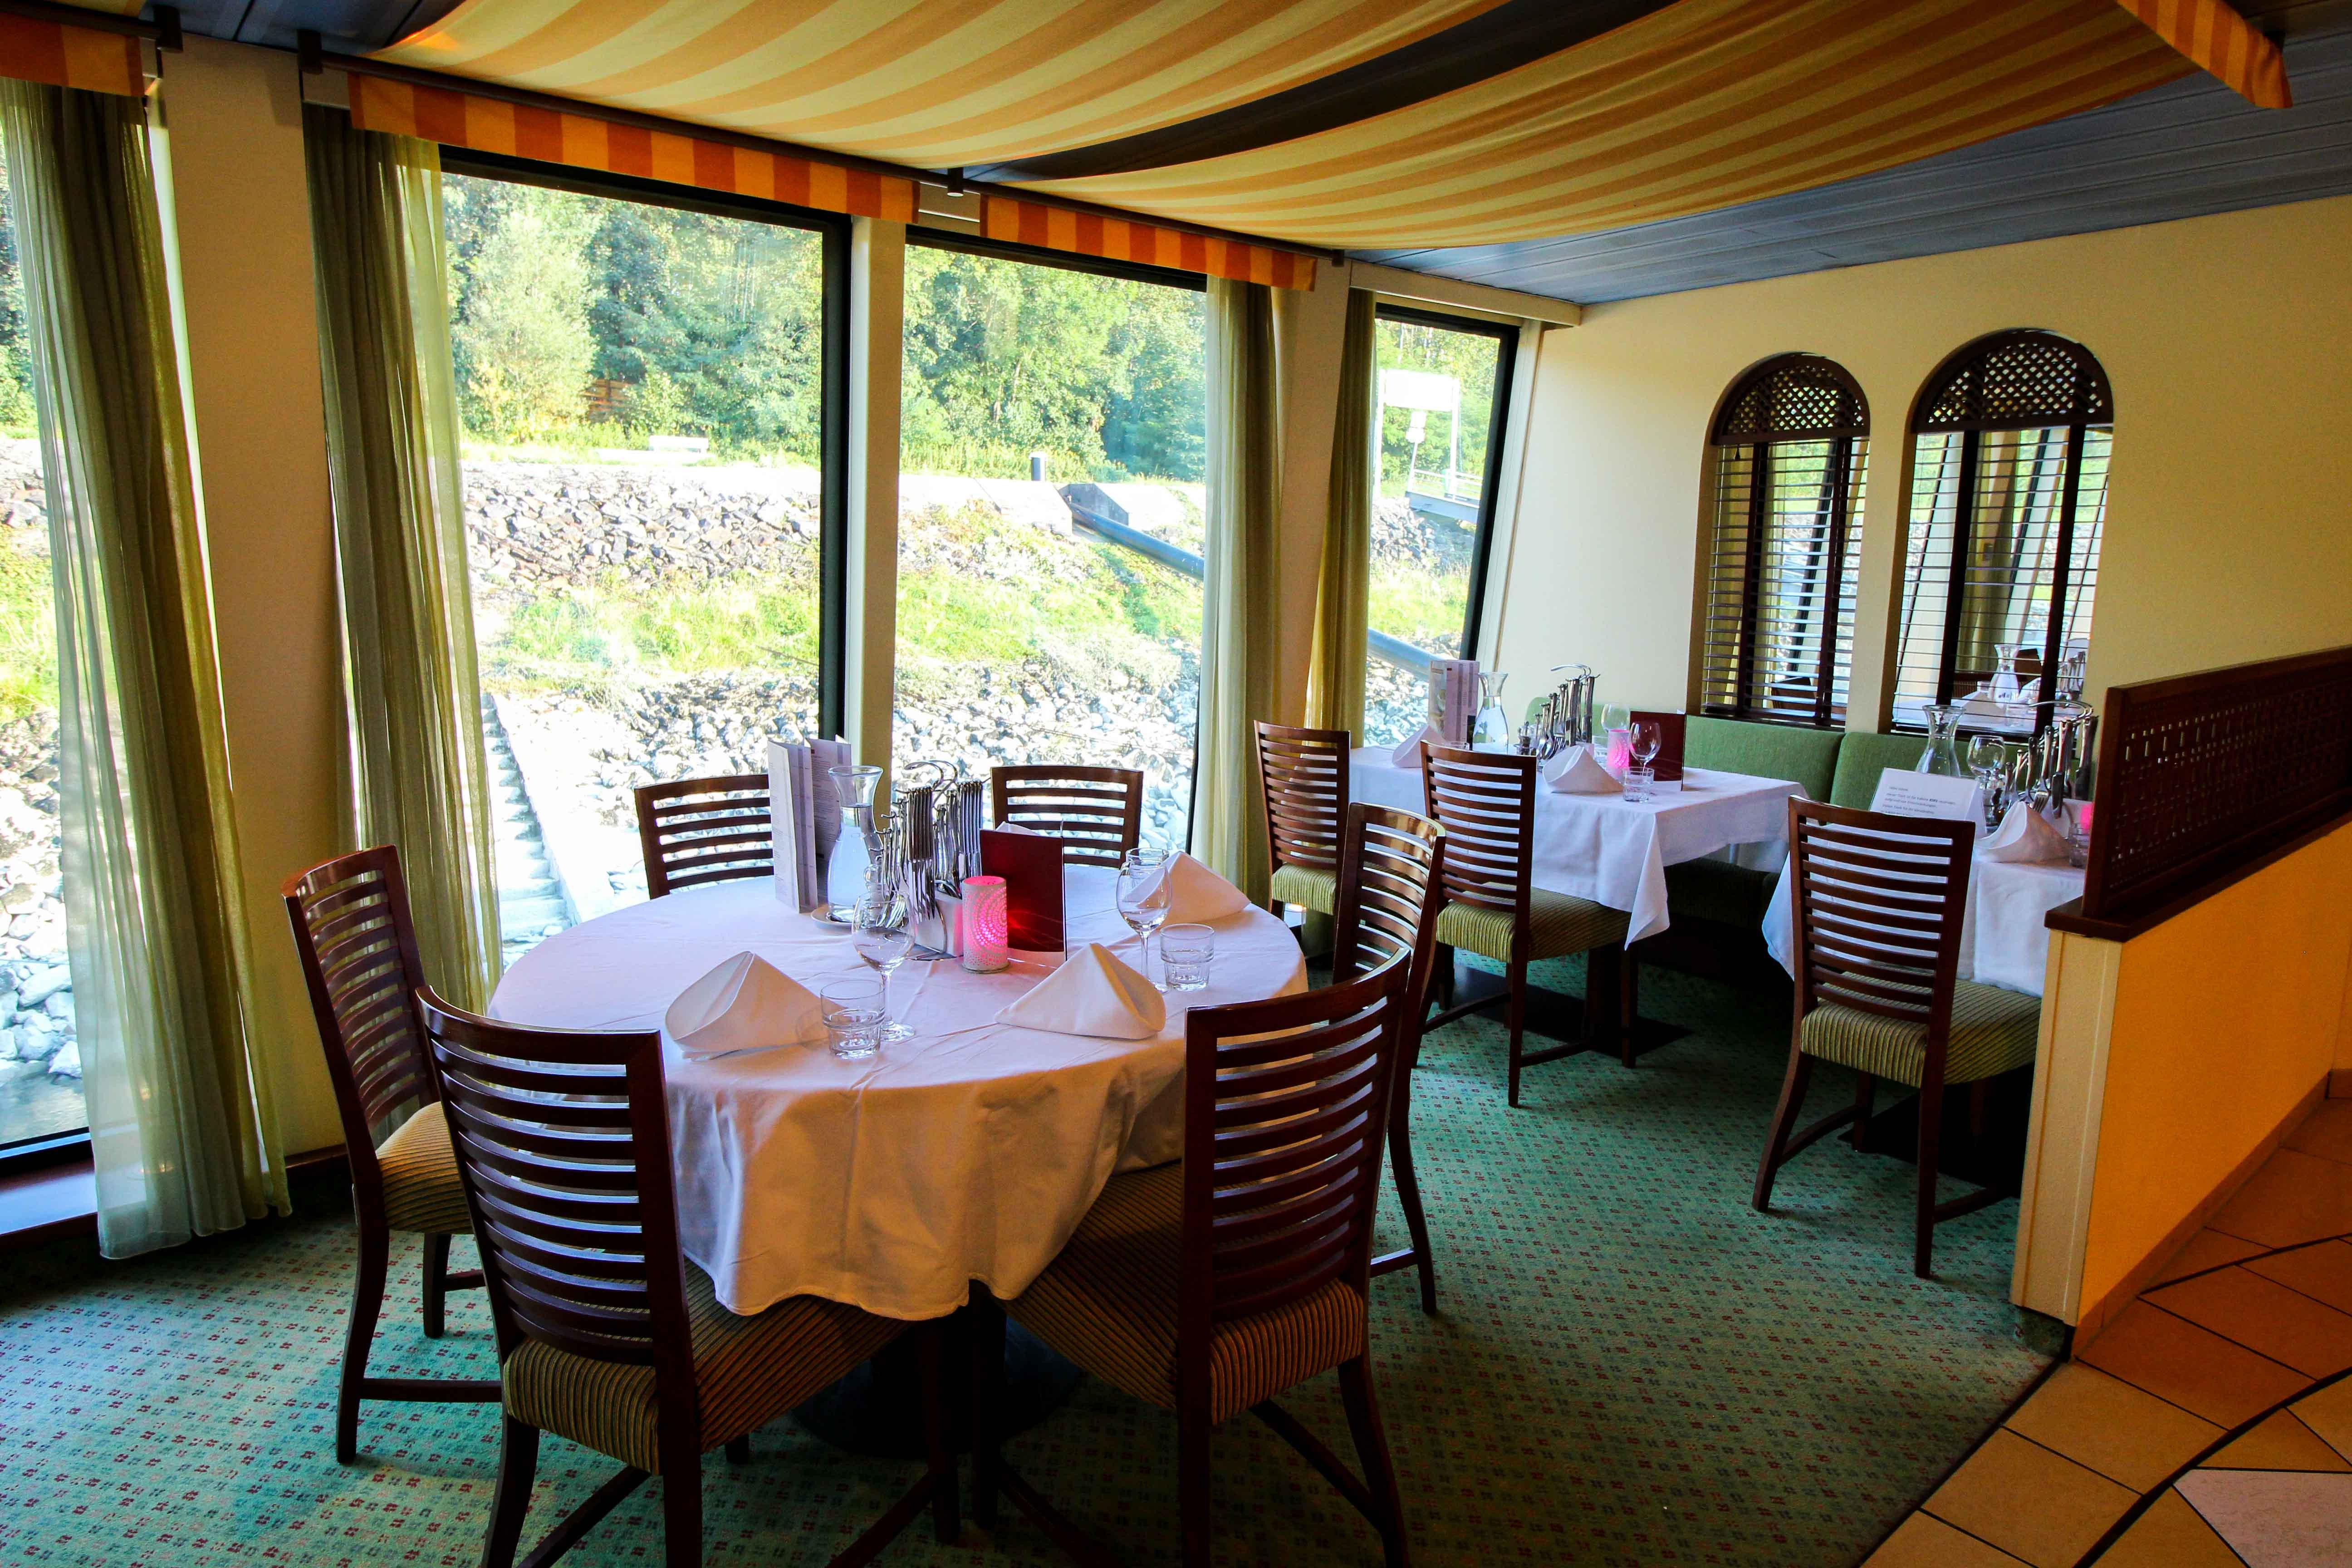 Donaukreuzfahrt A-Rosa Bella Restaurant Flusskreuzfahrt Flusskreuzfahrtschiff 7 Tage Donau Klassik Tour Arosa Reiseblogger